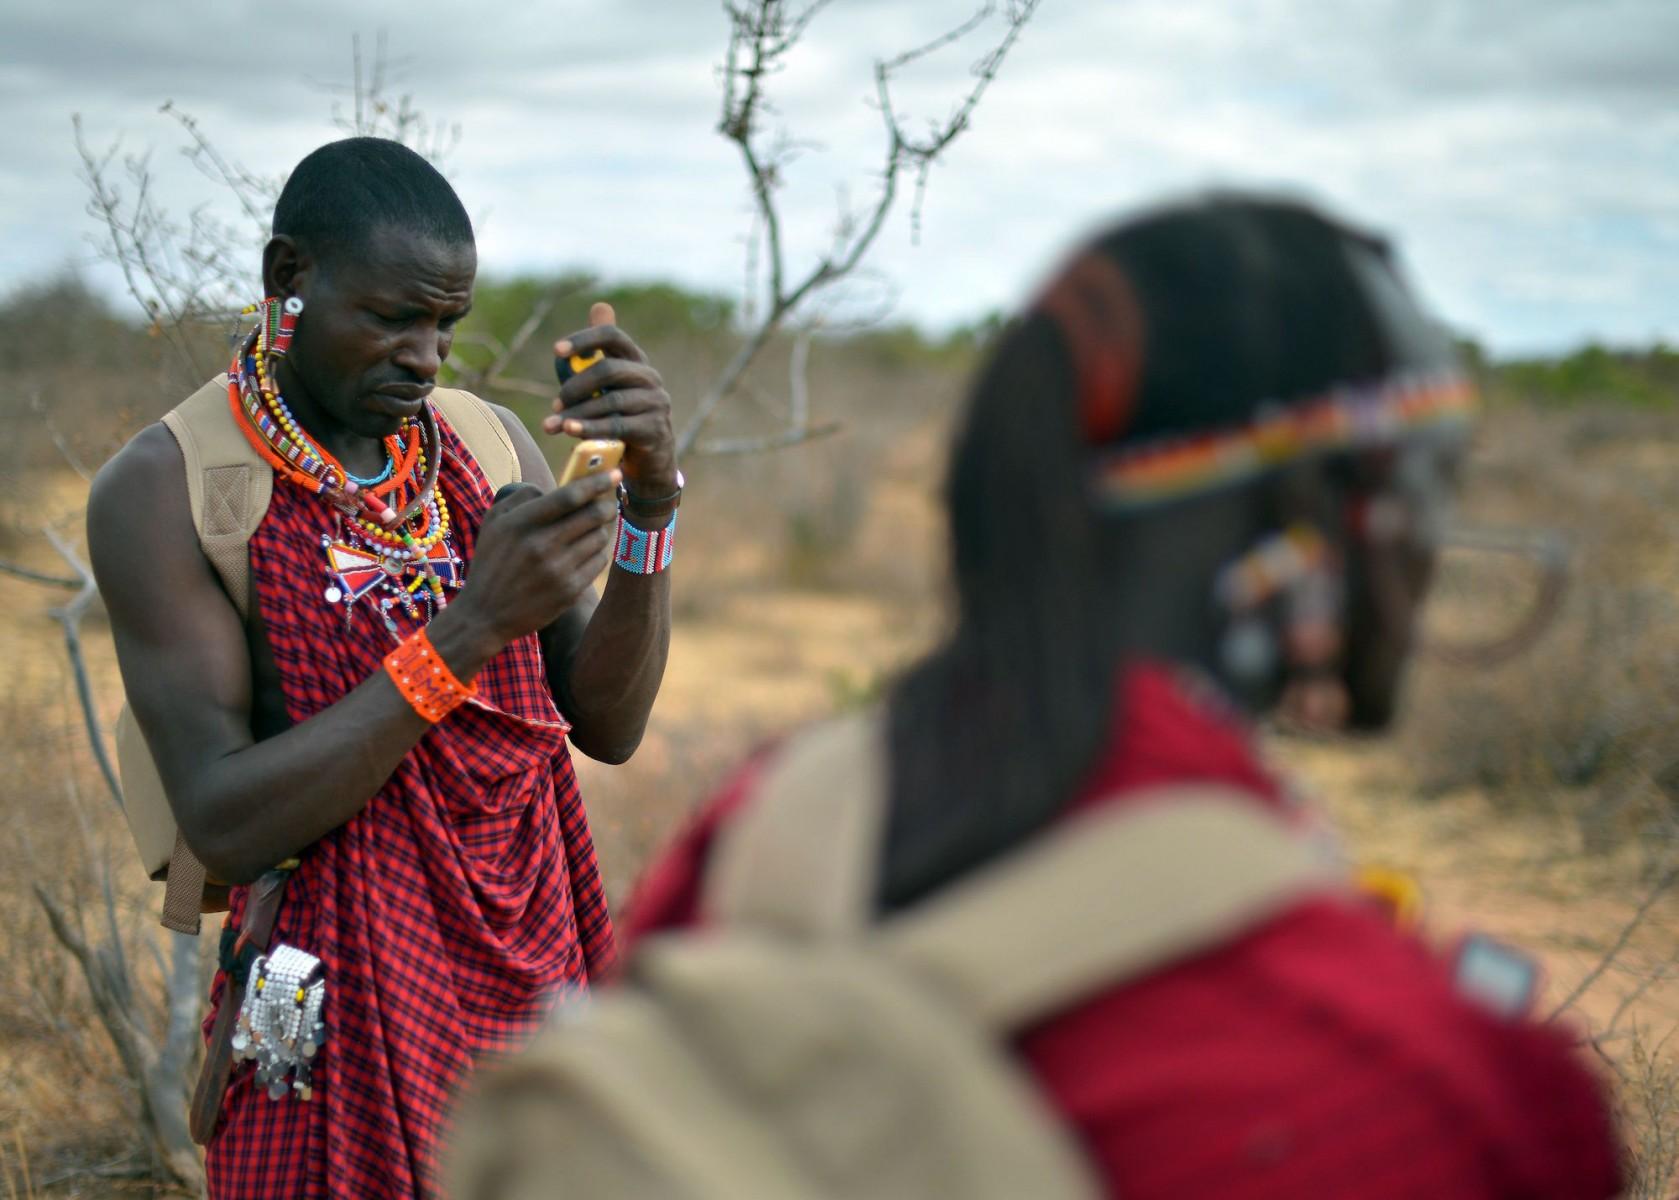 September 11, 2016, Masai